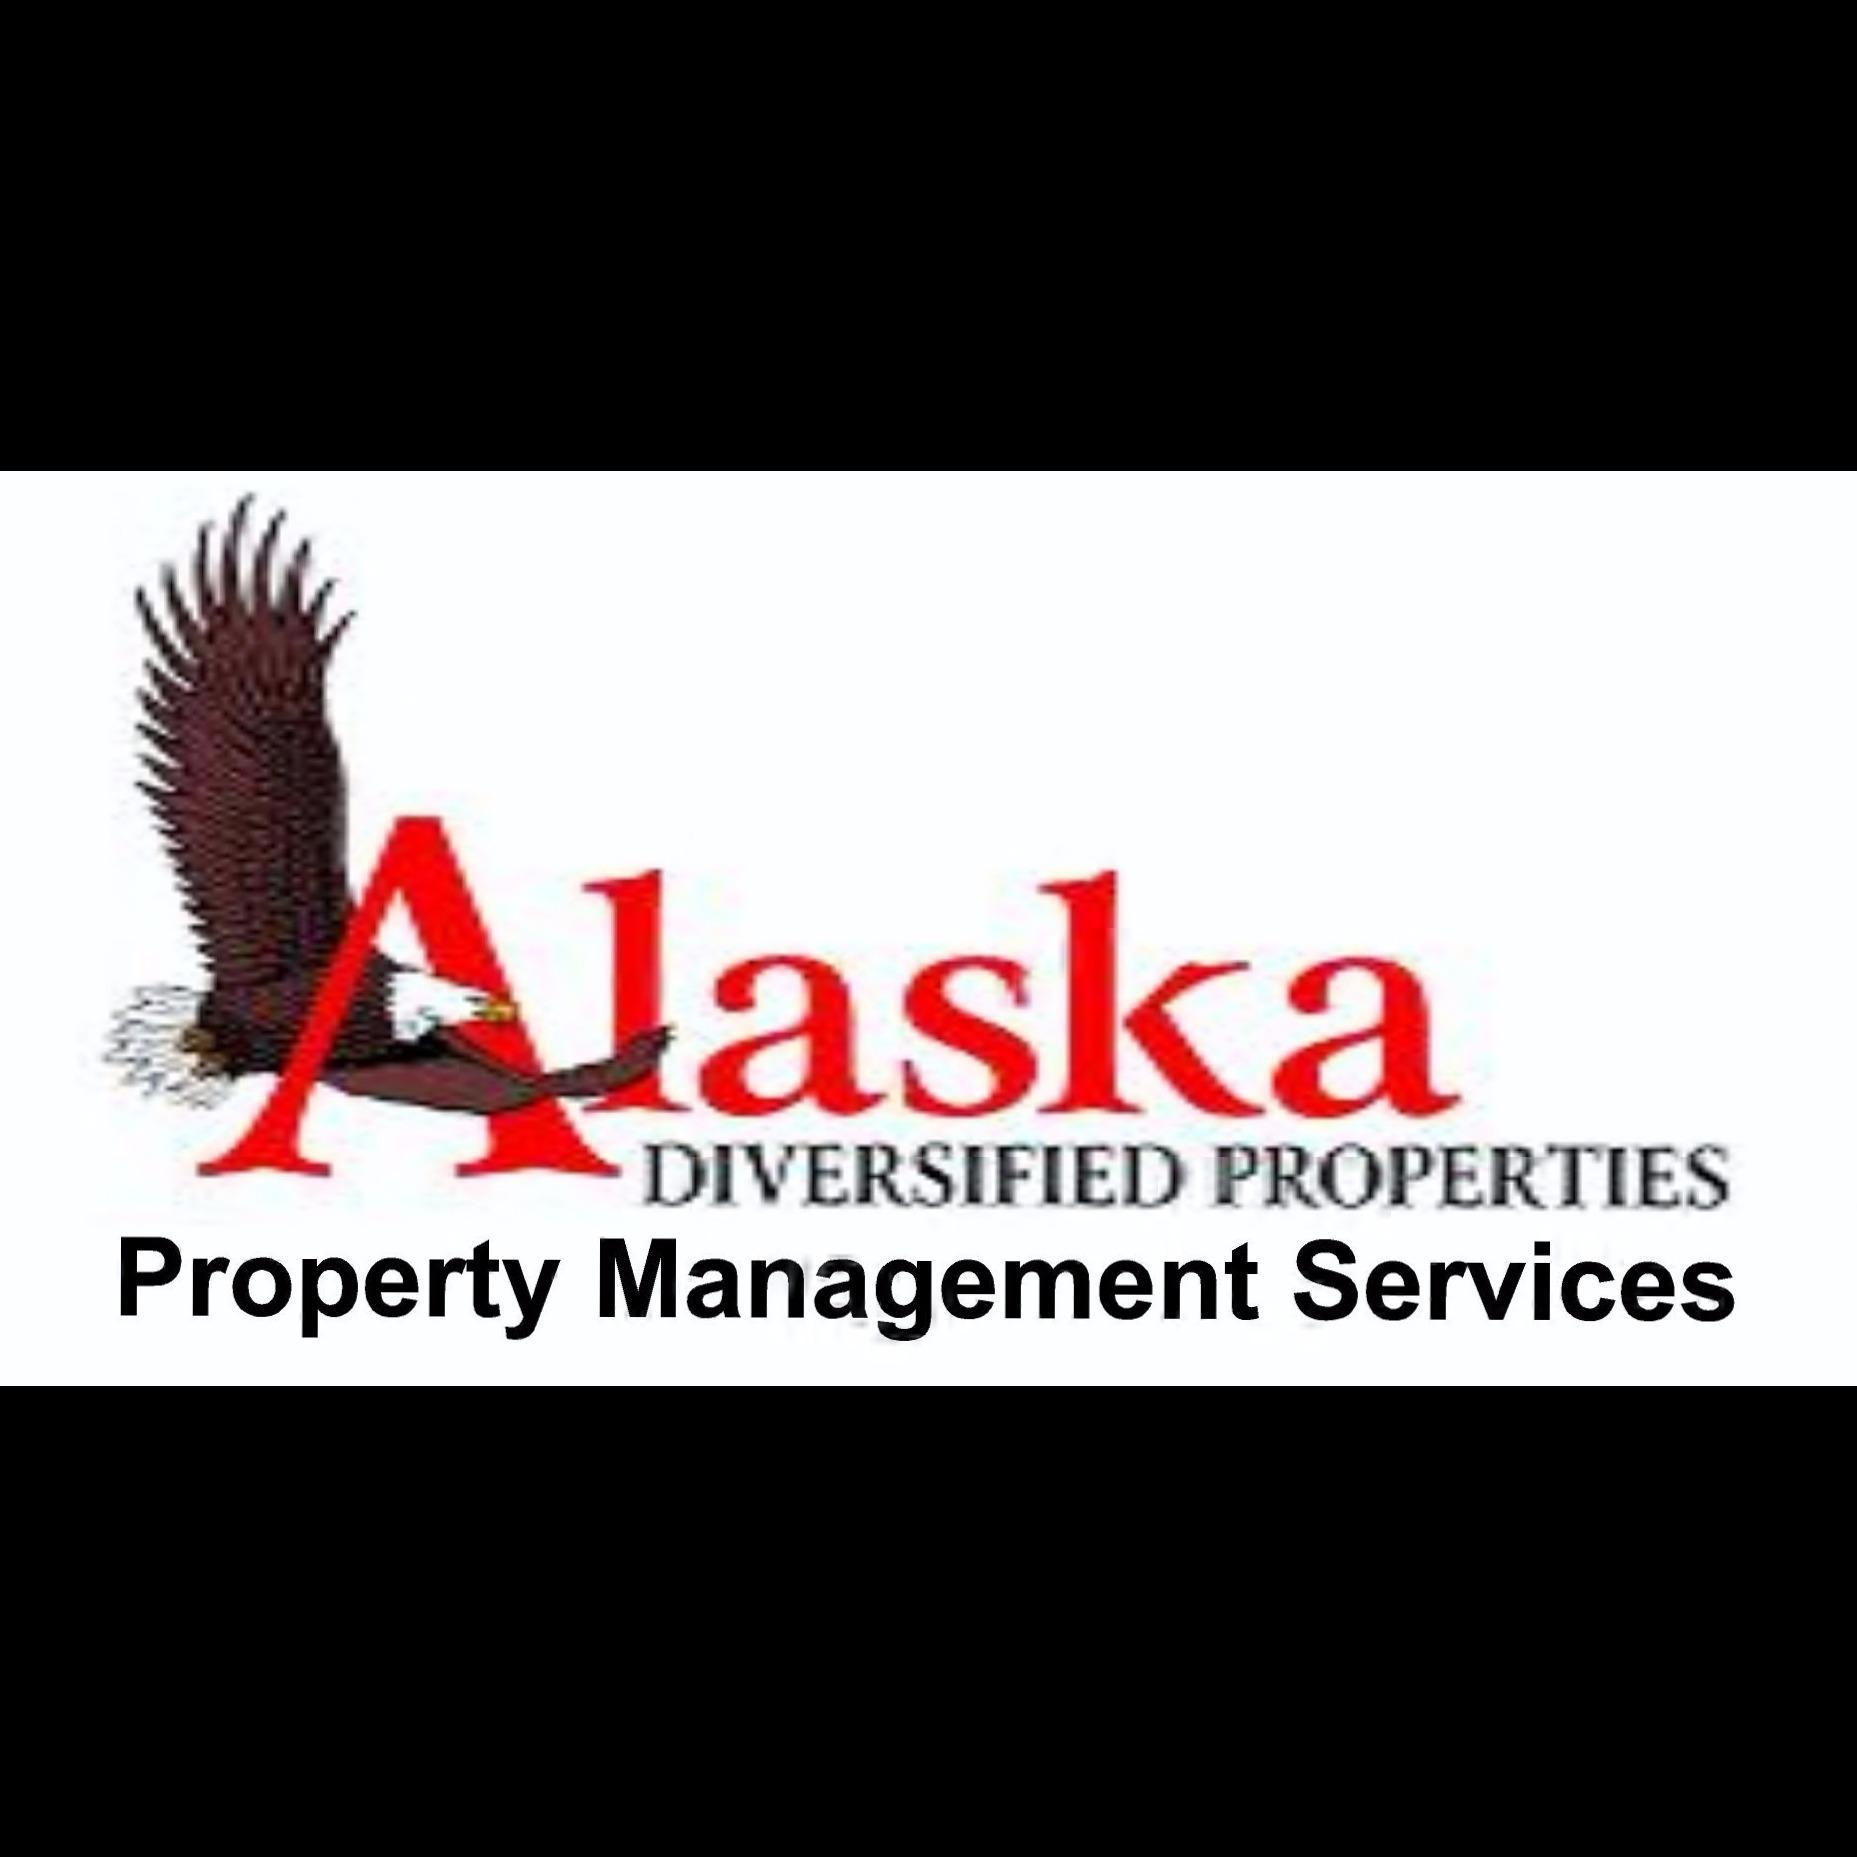 Alaska Diversified Properties